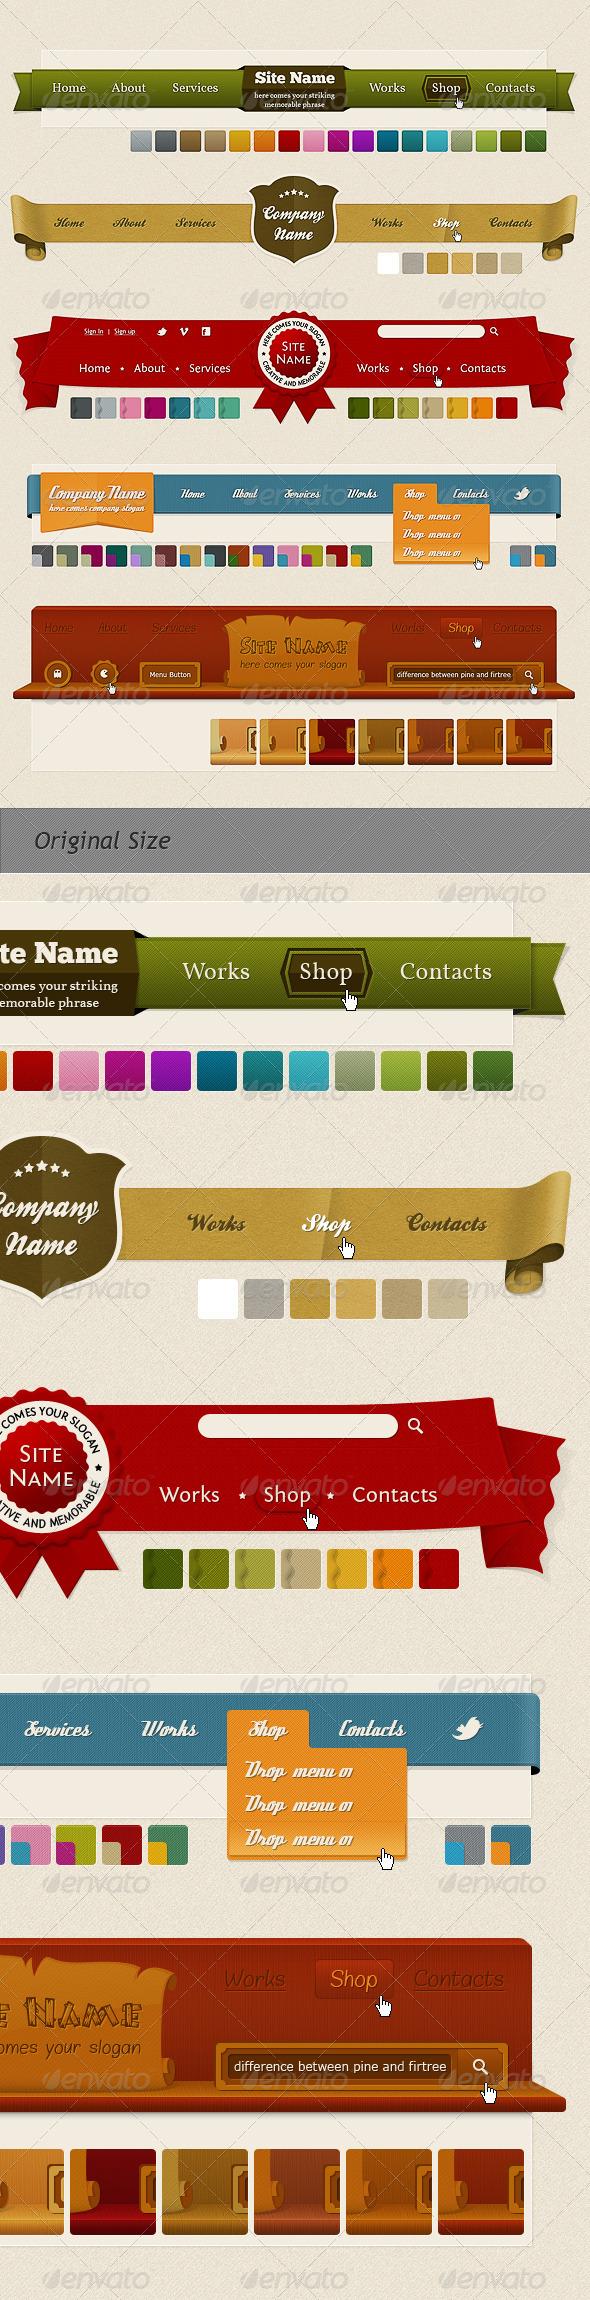 GraphicRiver Headers and Navigation Web Kit 254934